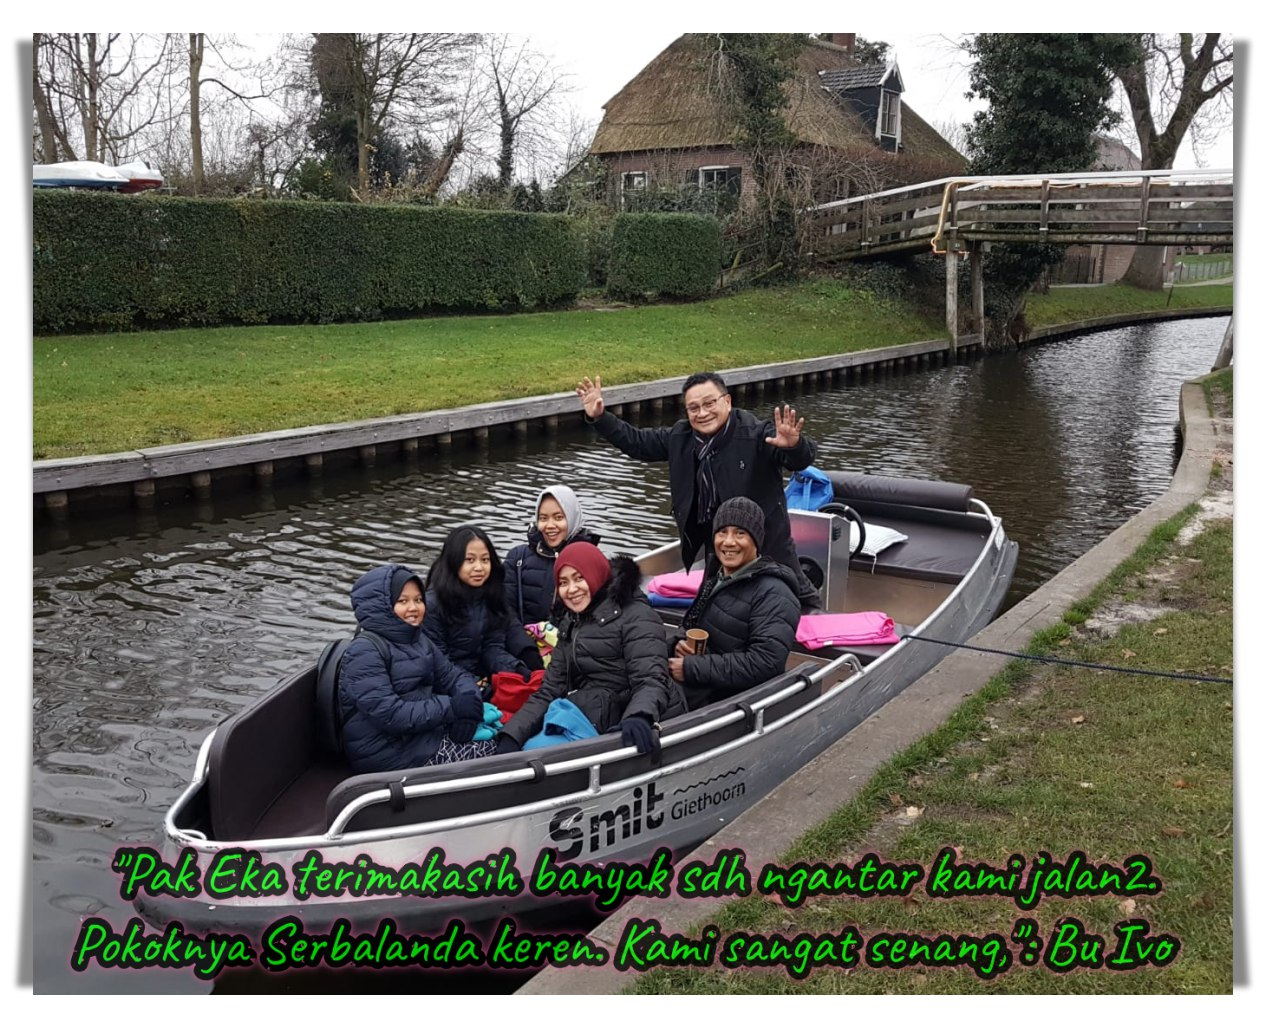 Pak Eka Tanjung, Jalan-jalan di Belanda, Berlayar di Giethoorn, Dusun Air, Serbalanda, Serbalanda Tour, Pemandu Orang Indonesia di Eropa. Pak Eka Terima Kasih telah membawa kami jalan-jalan.